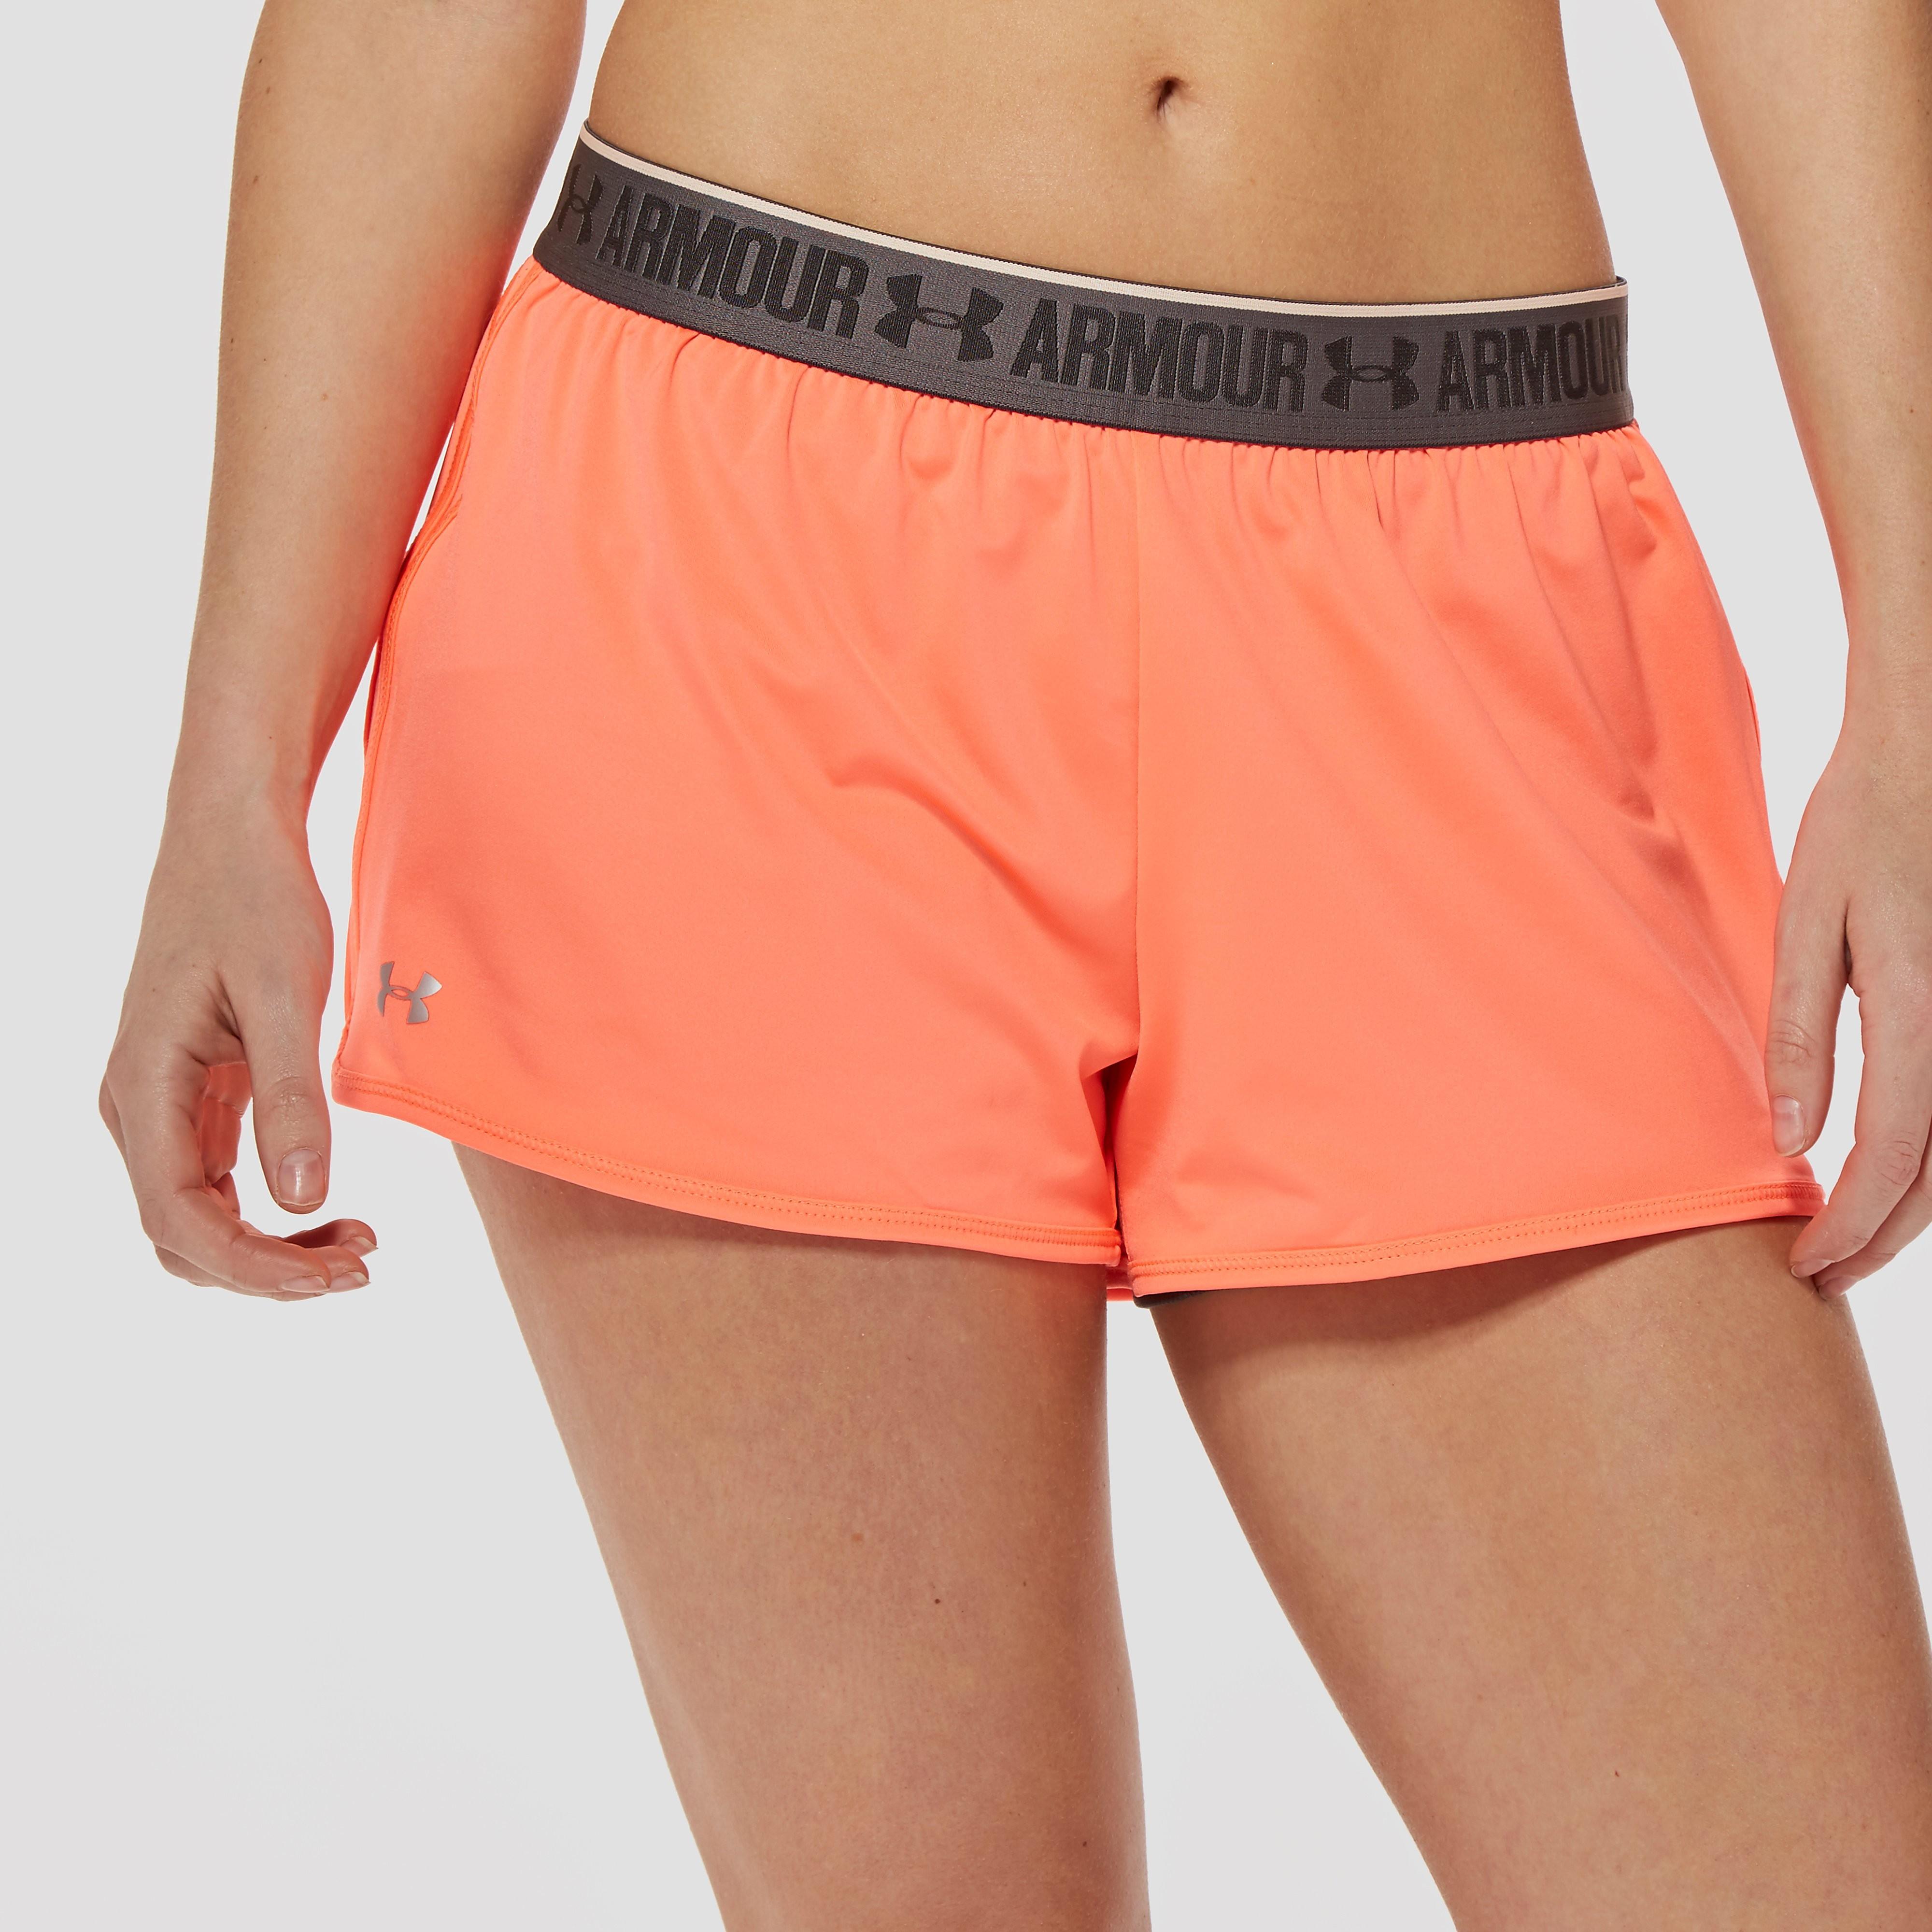 Under Armour HeatGear 2-in-1 Shorty Women's Running Shorts